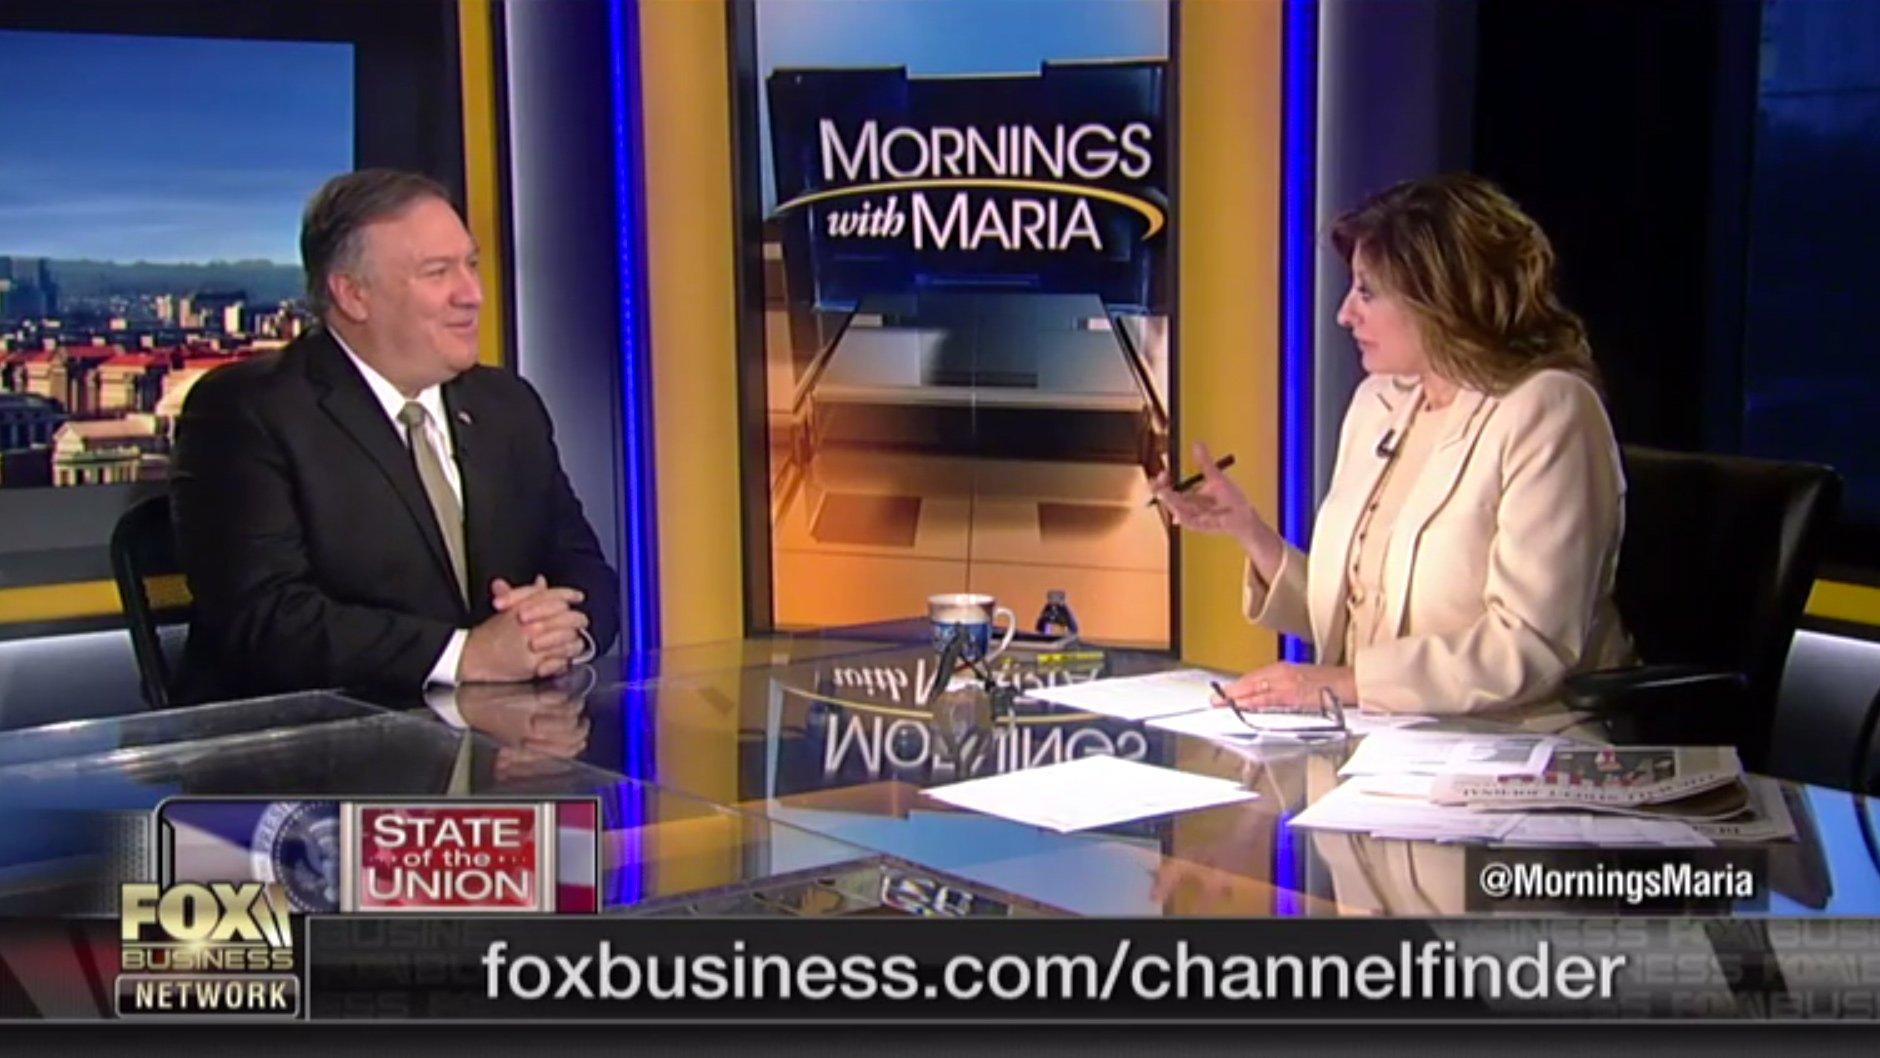 Secretary Pompeo's interview with Maria Bartiromo of Fox Business